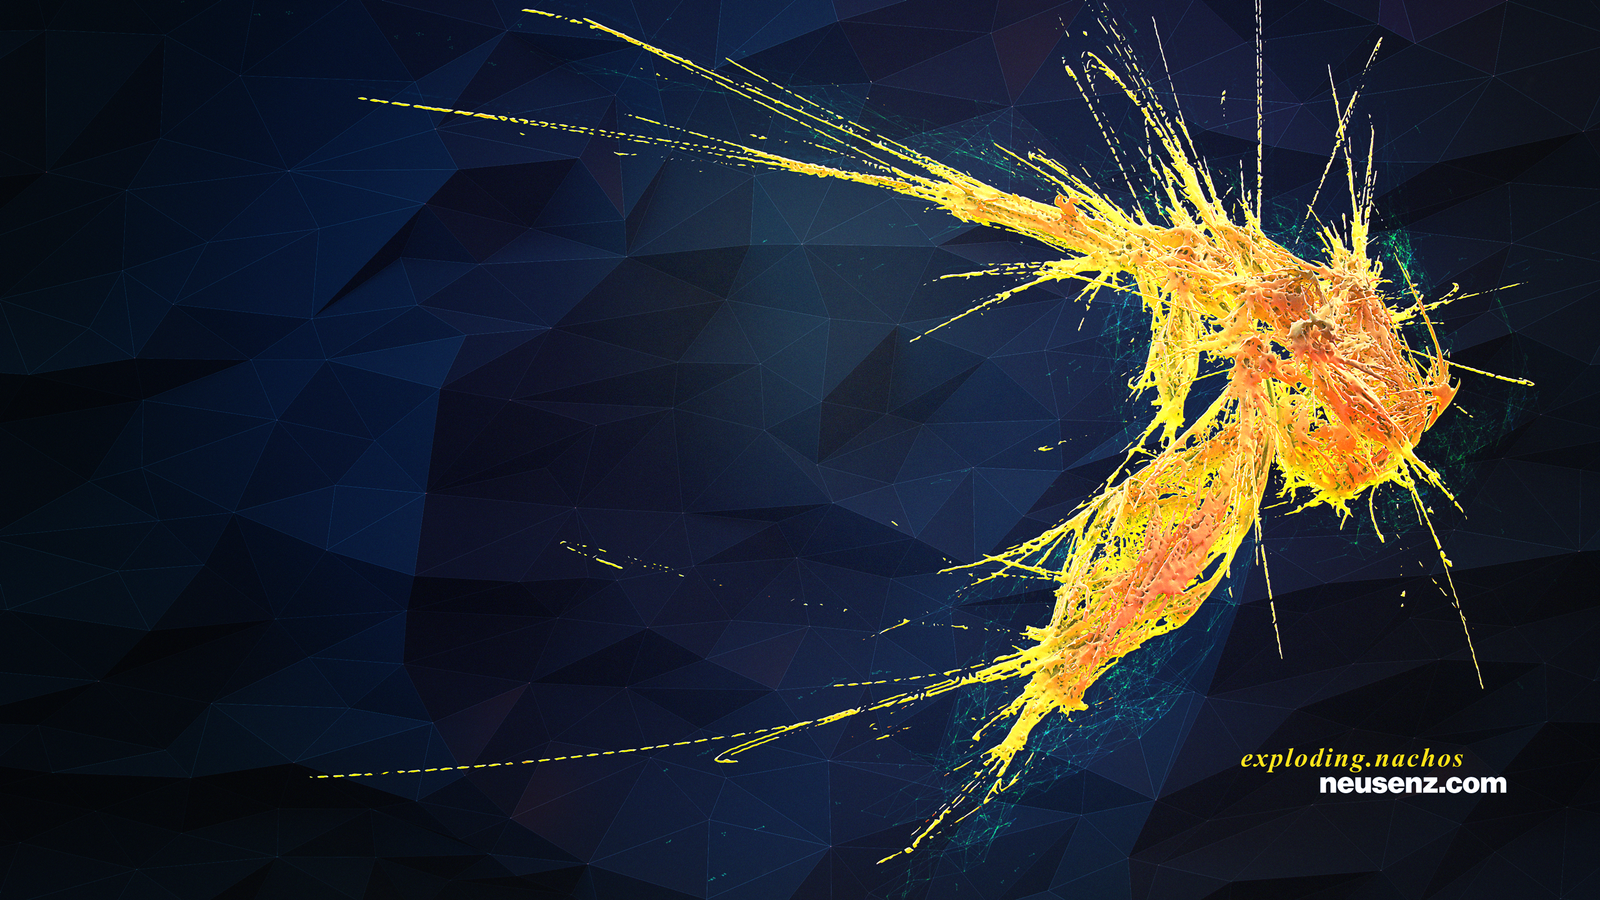 Exploding Nachos by neutrix